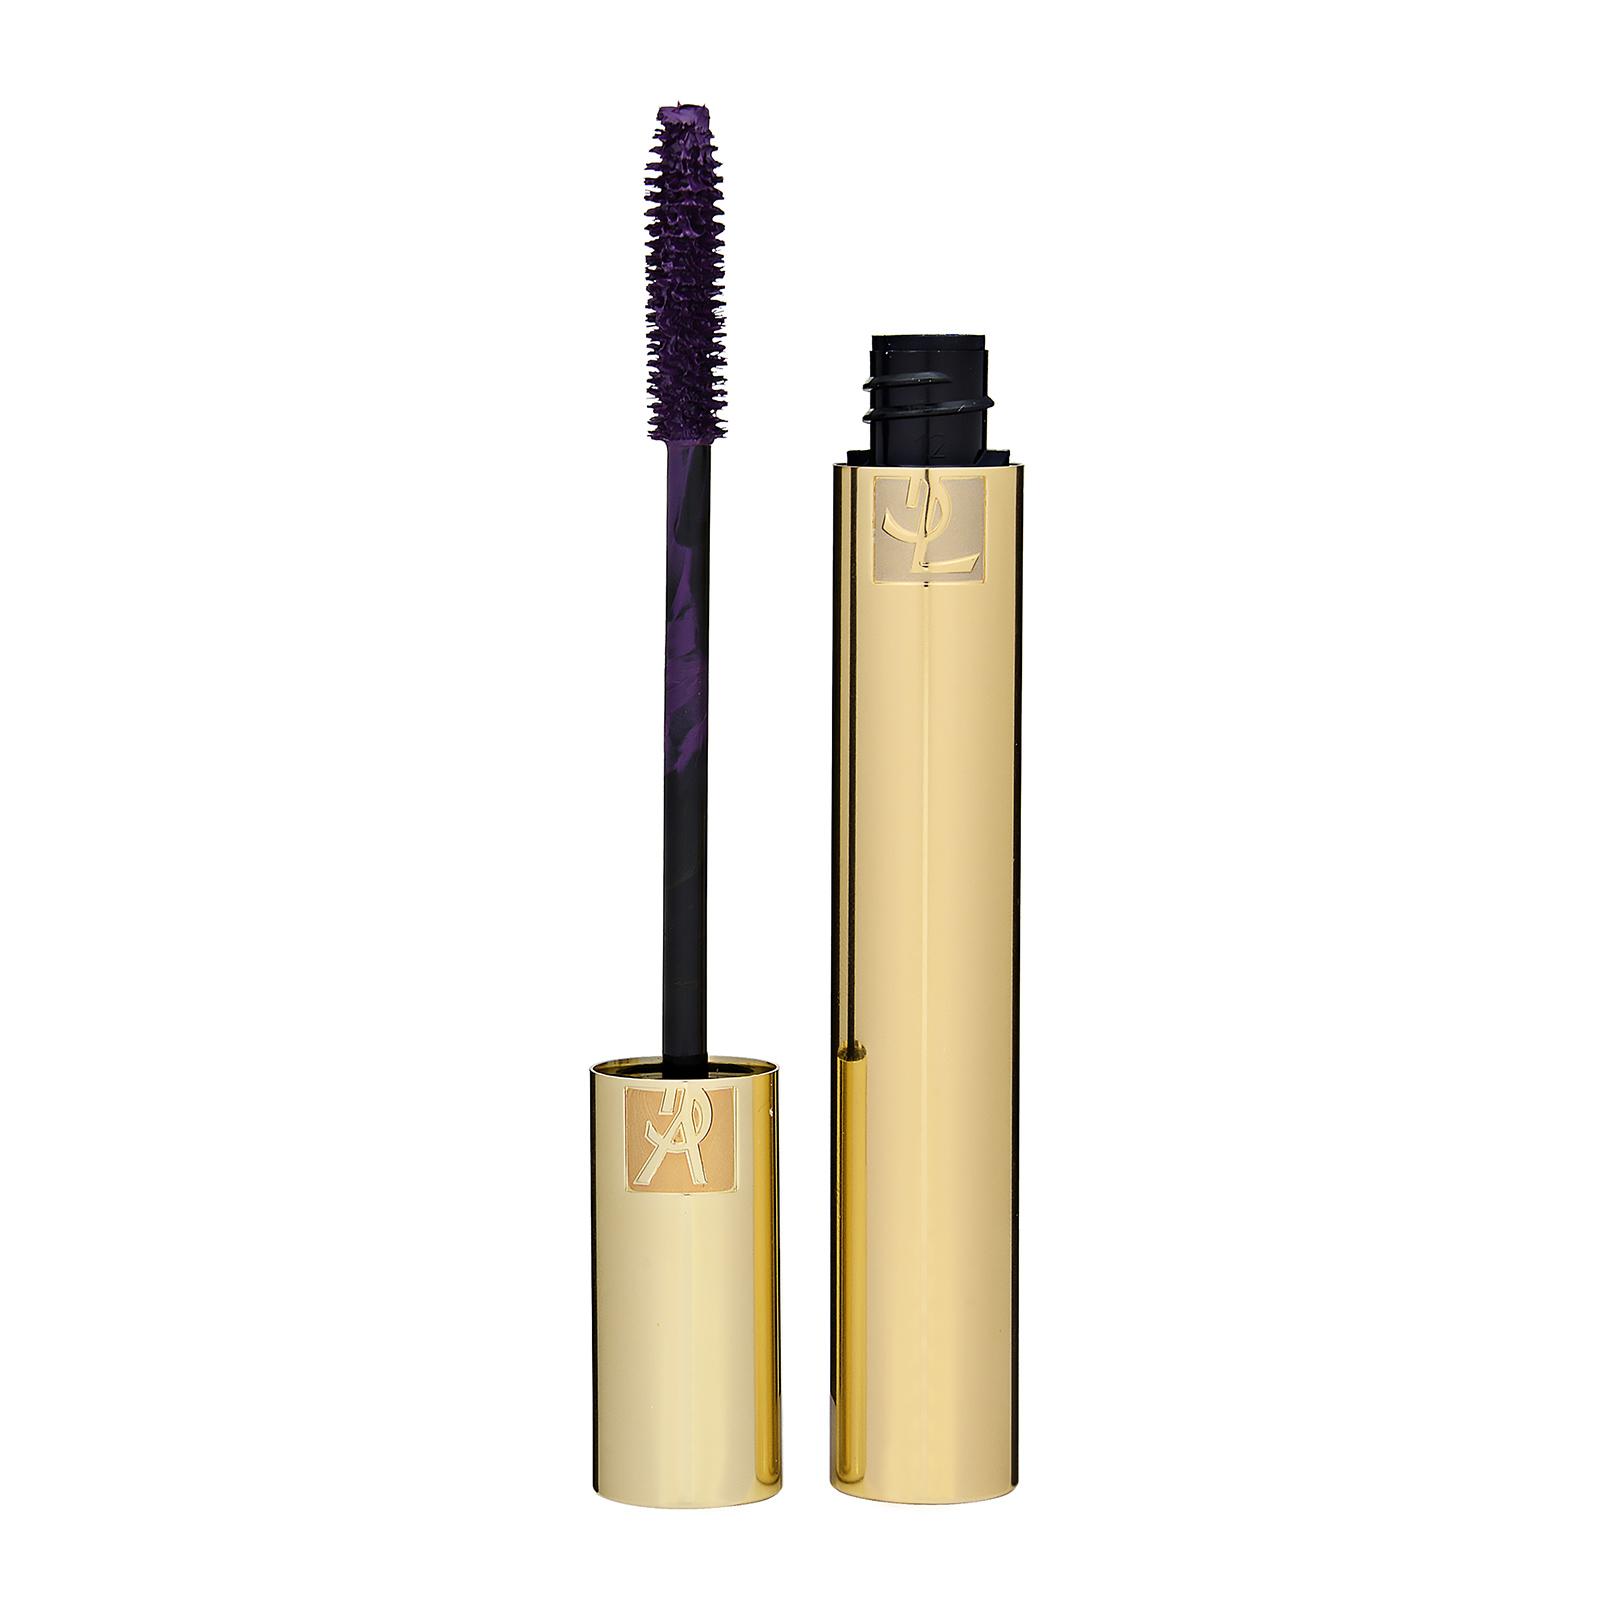 Yves Saint Laurent Mascara Volume Effet Faux Cils Luxurious Mascara For A False Lash Effect 4 Fascinating Violet, 0.2oz, 7.5ml